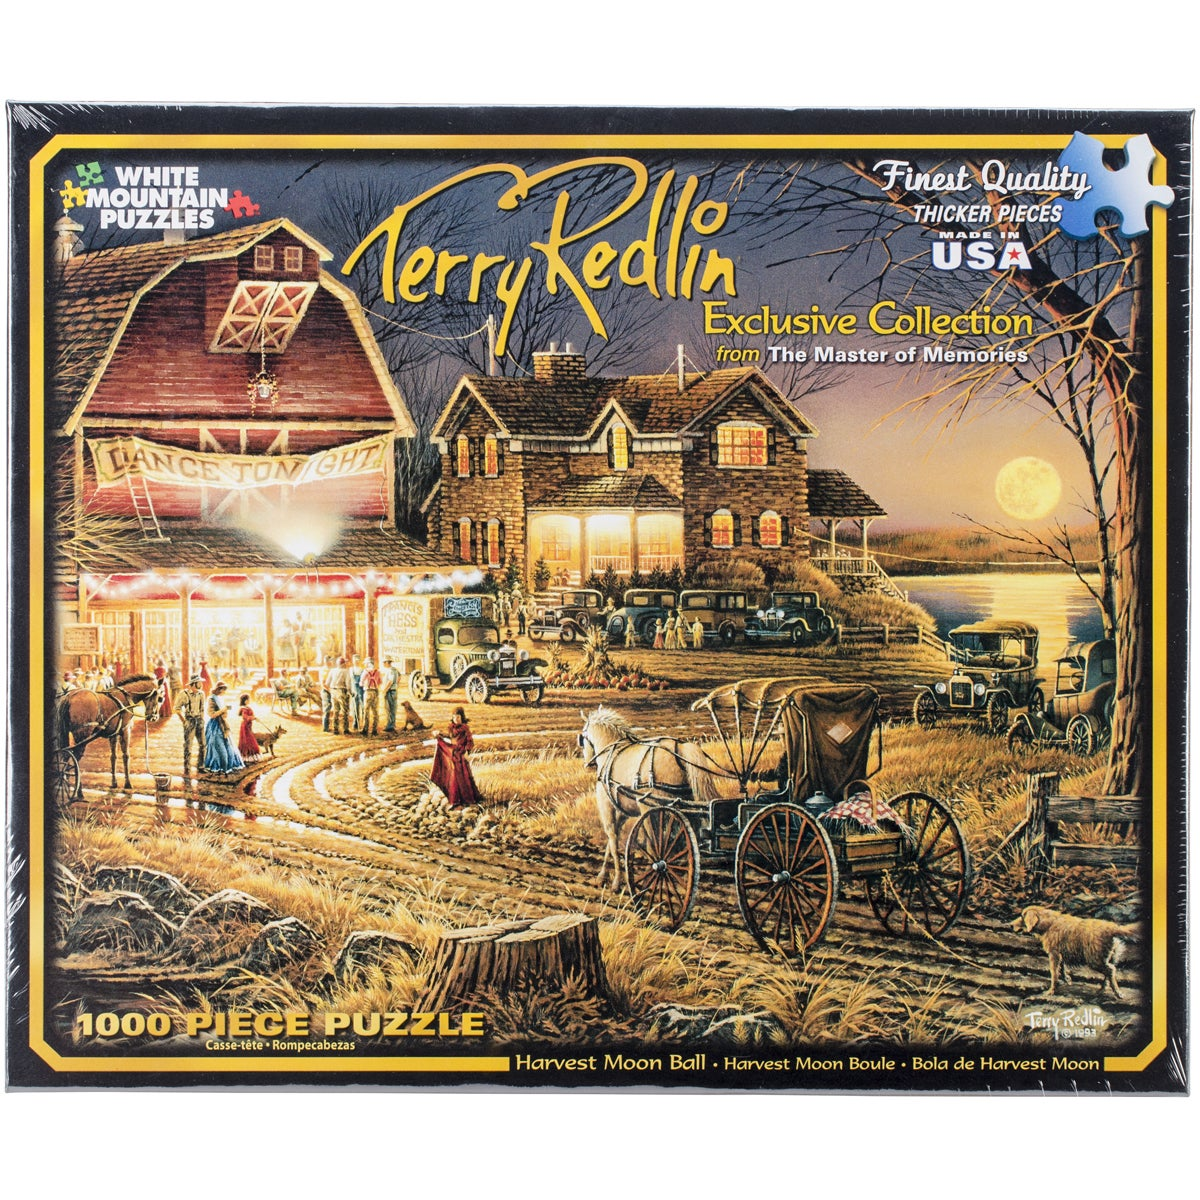 White Mountain Puzzles Jigsaw Puzzle Terry Redlin 1000 Pi...